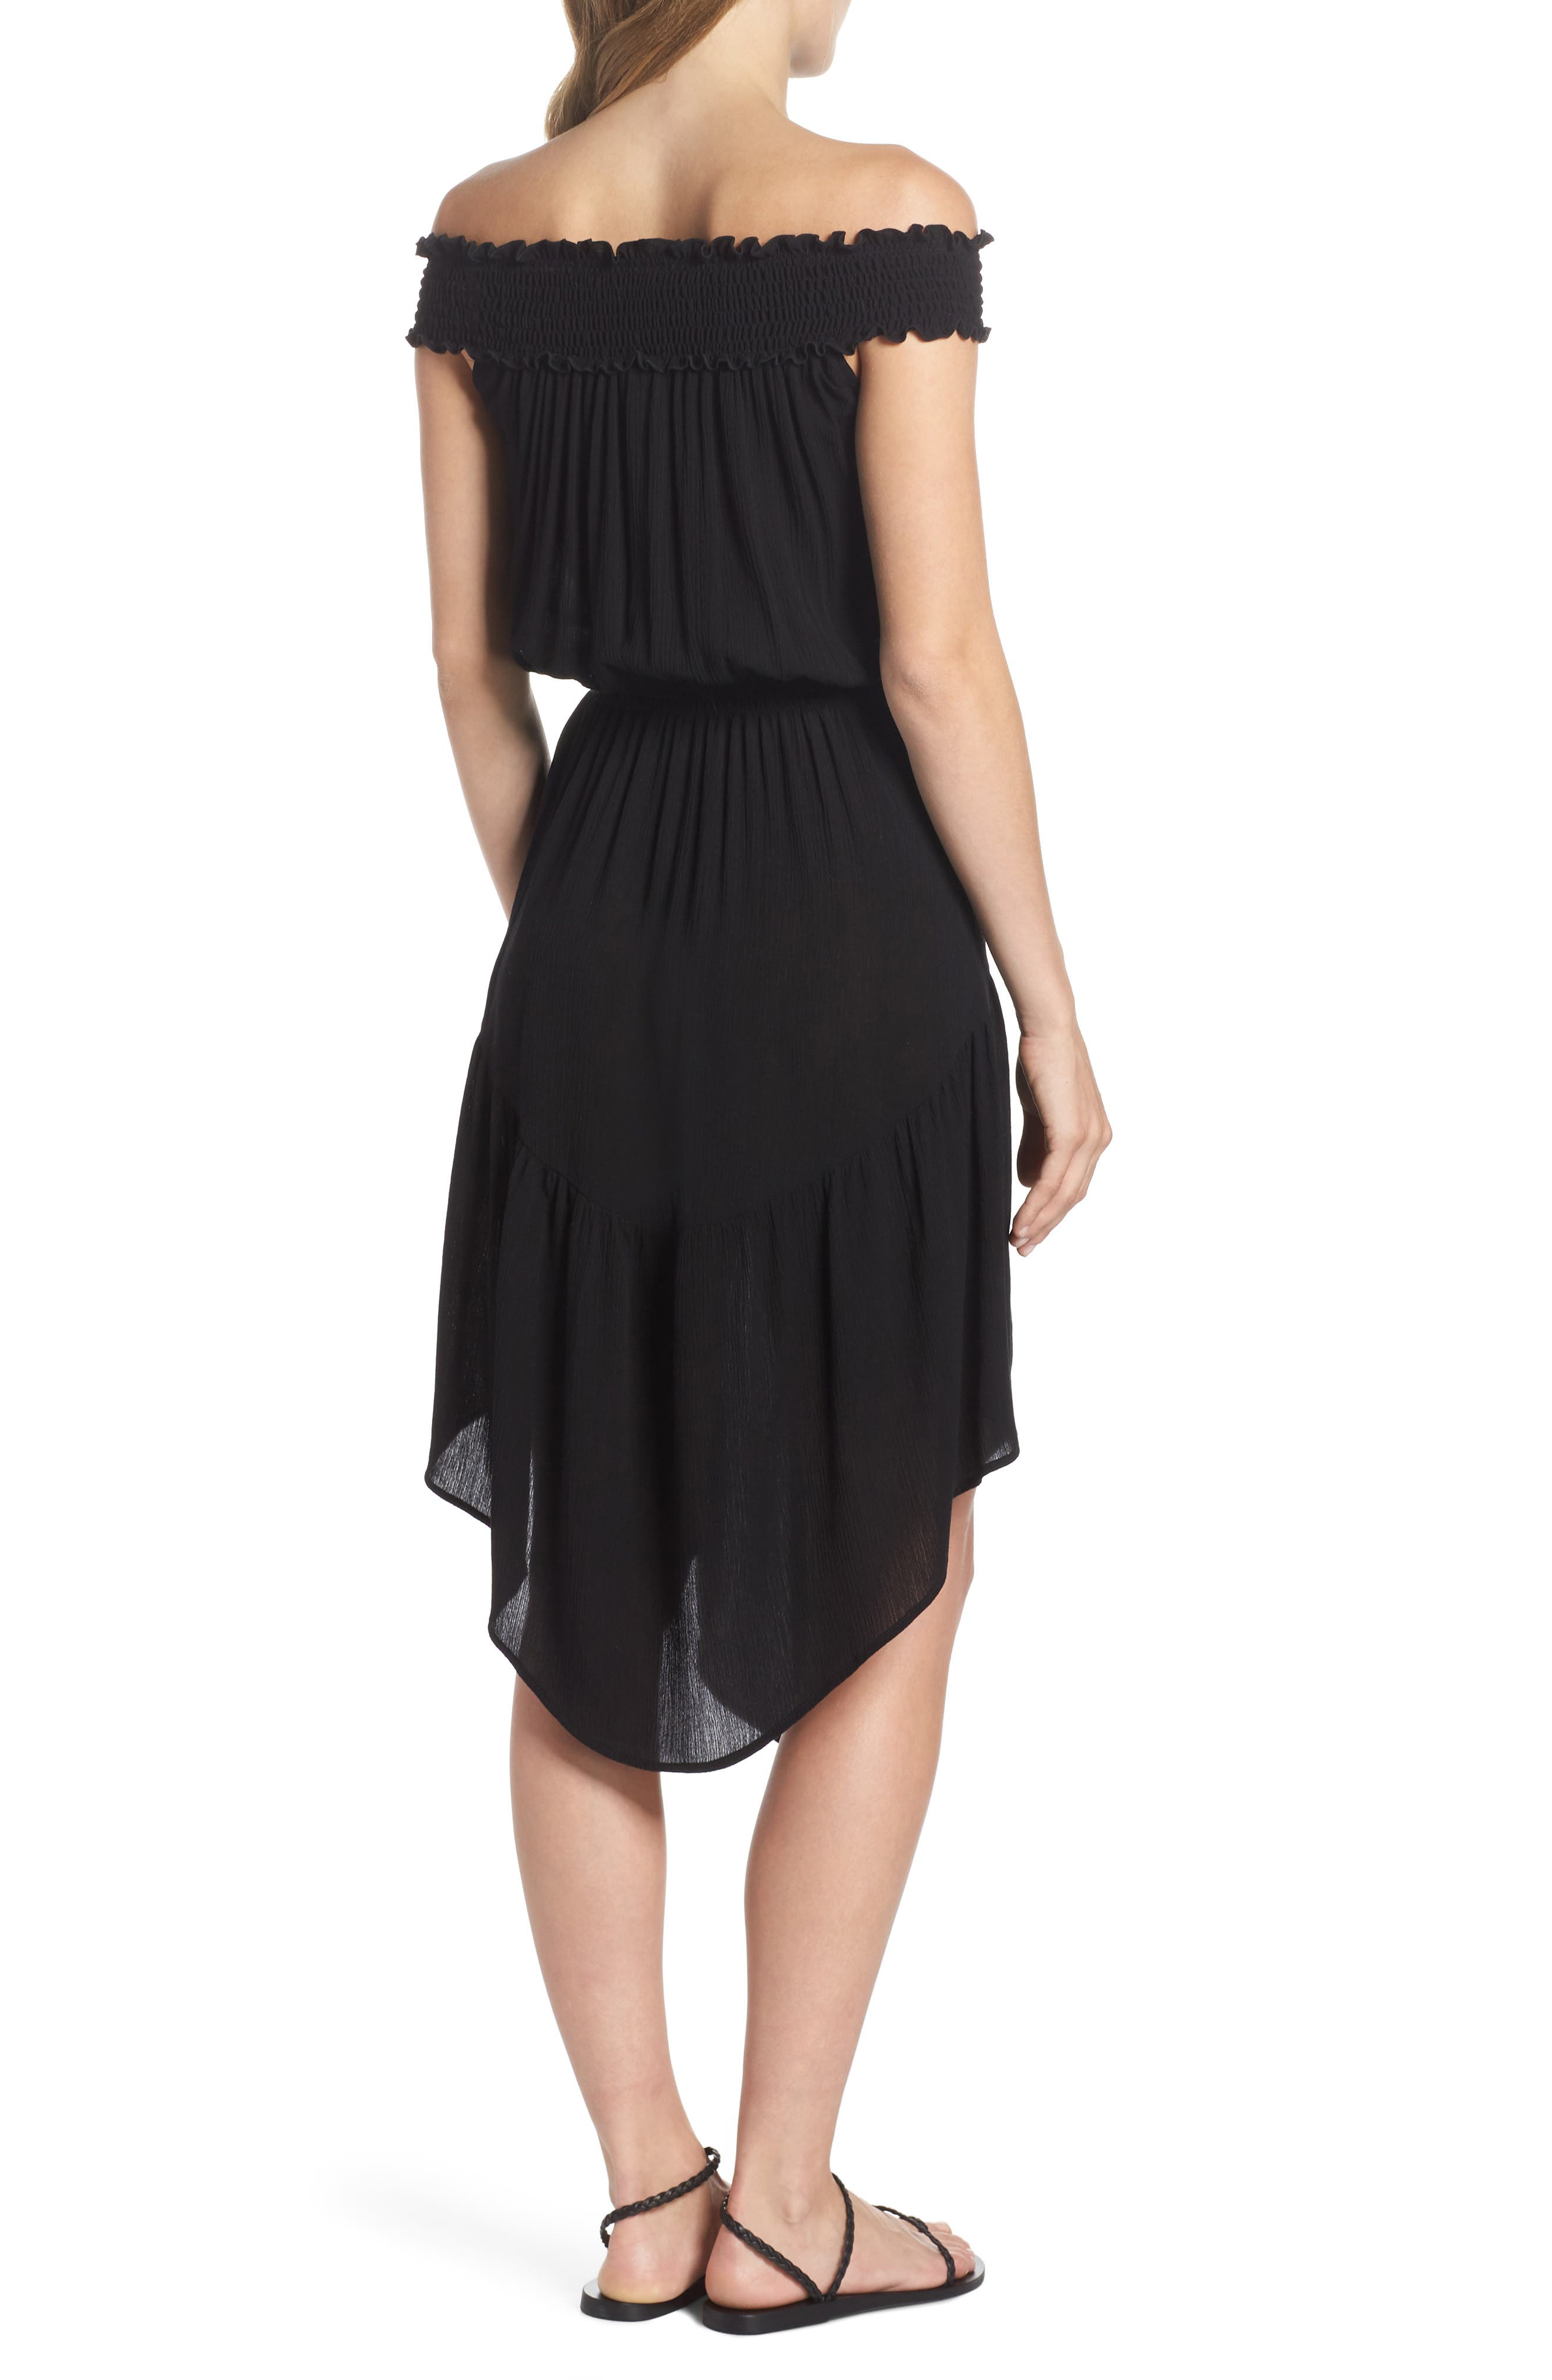 Summer Breeze Off the Shoulder Cover-Up Dress,                             Alternate thumbnail 2, color,                             Black